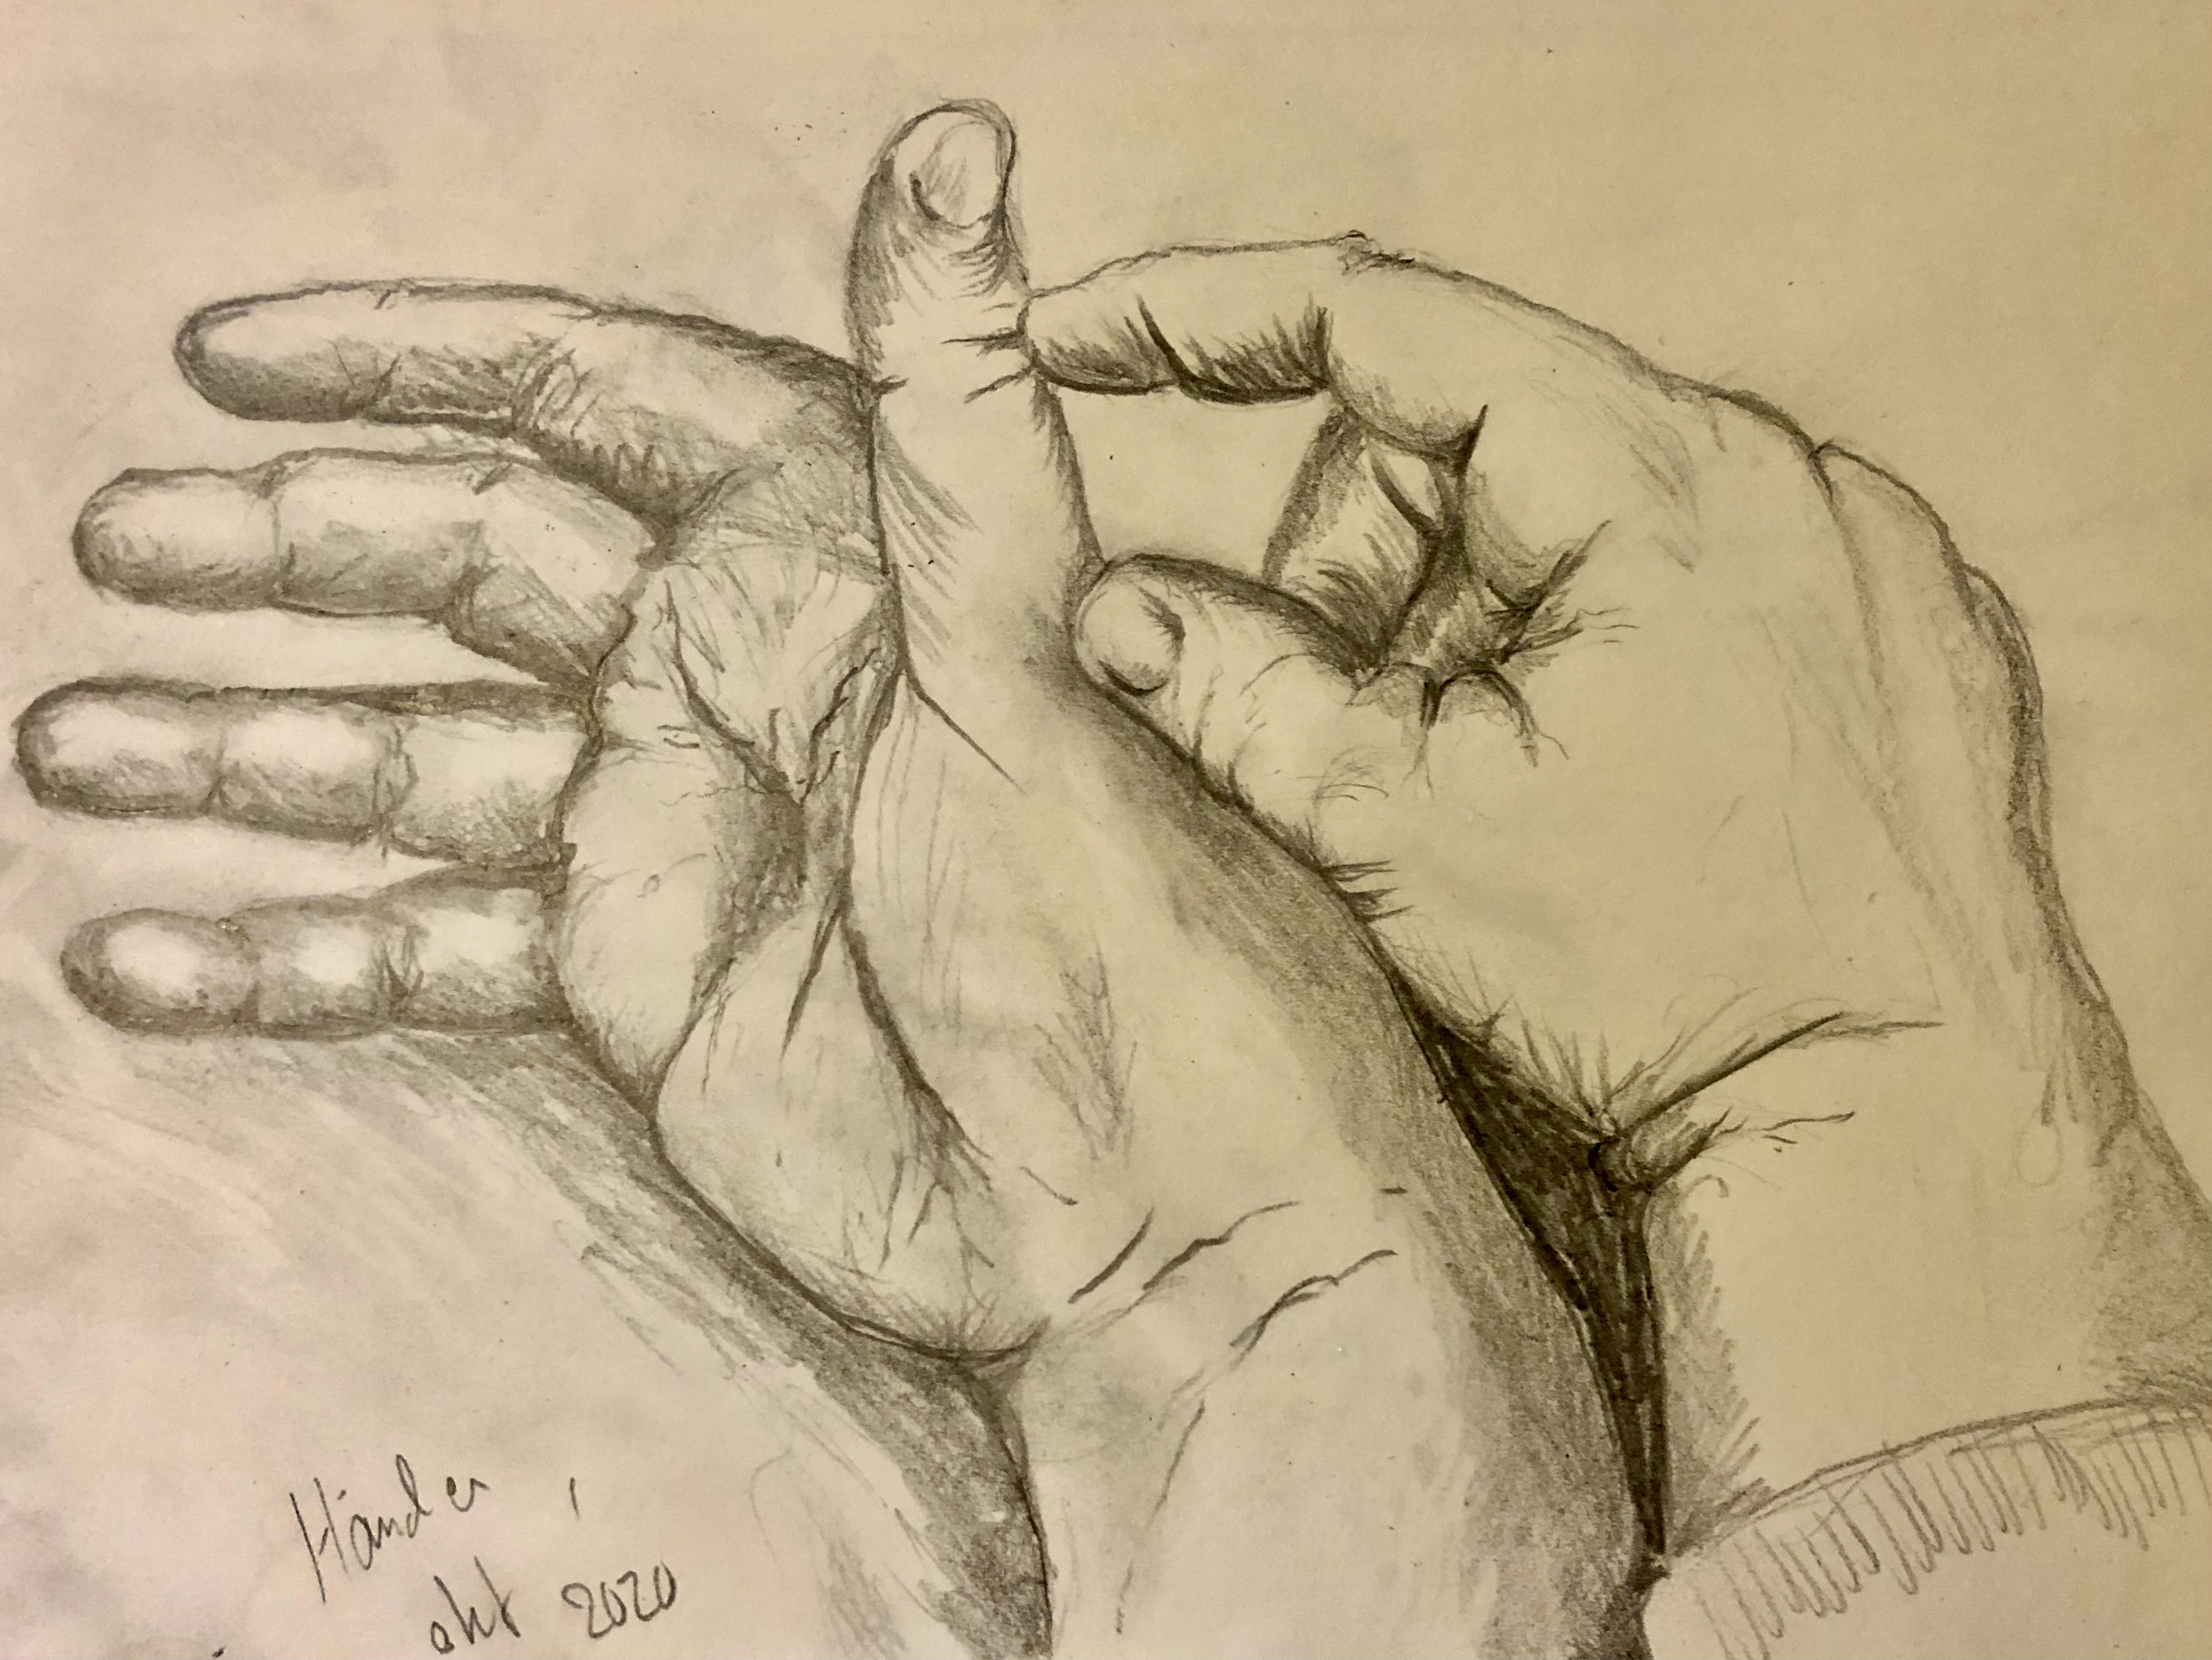 Blyertsteckning av händer på vitt papper